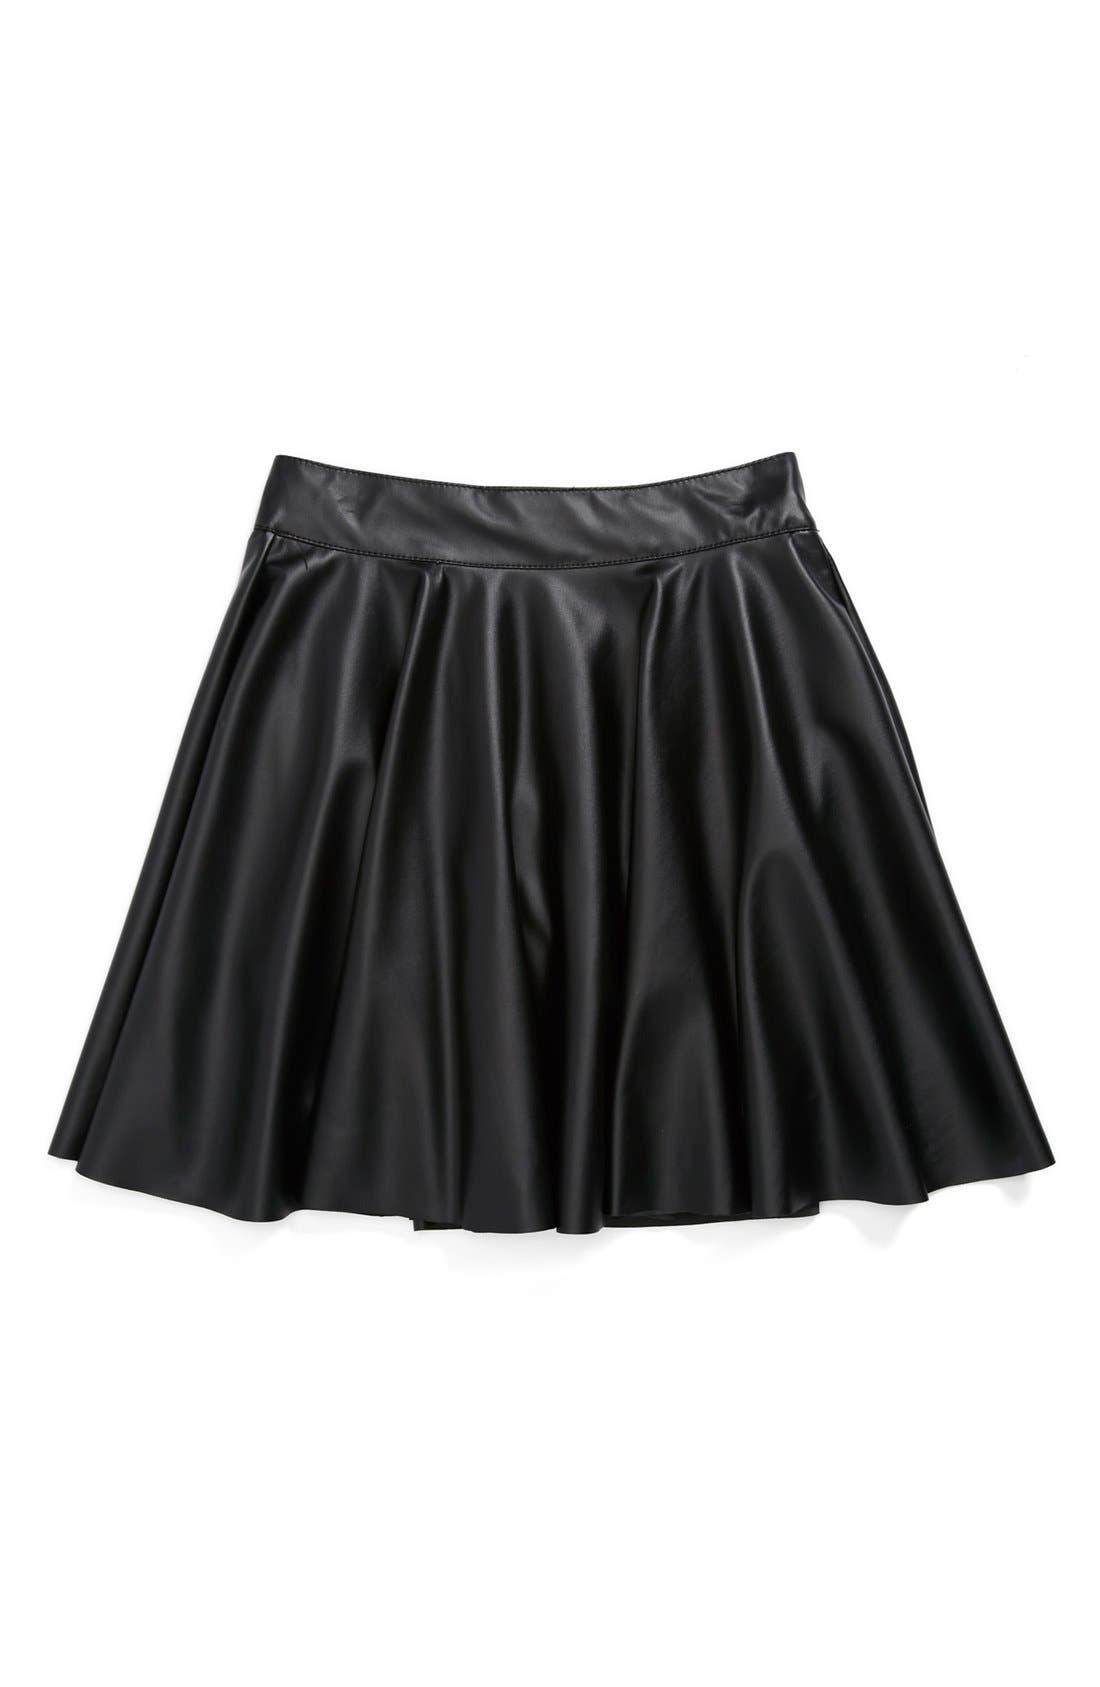 Alternate Image 1 Selected - Un Deux Trois 'Flirt' Skirt (Big Girls)